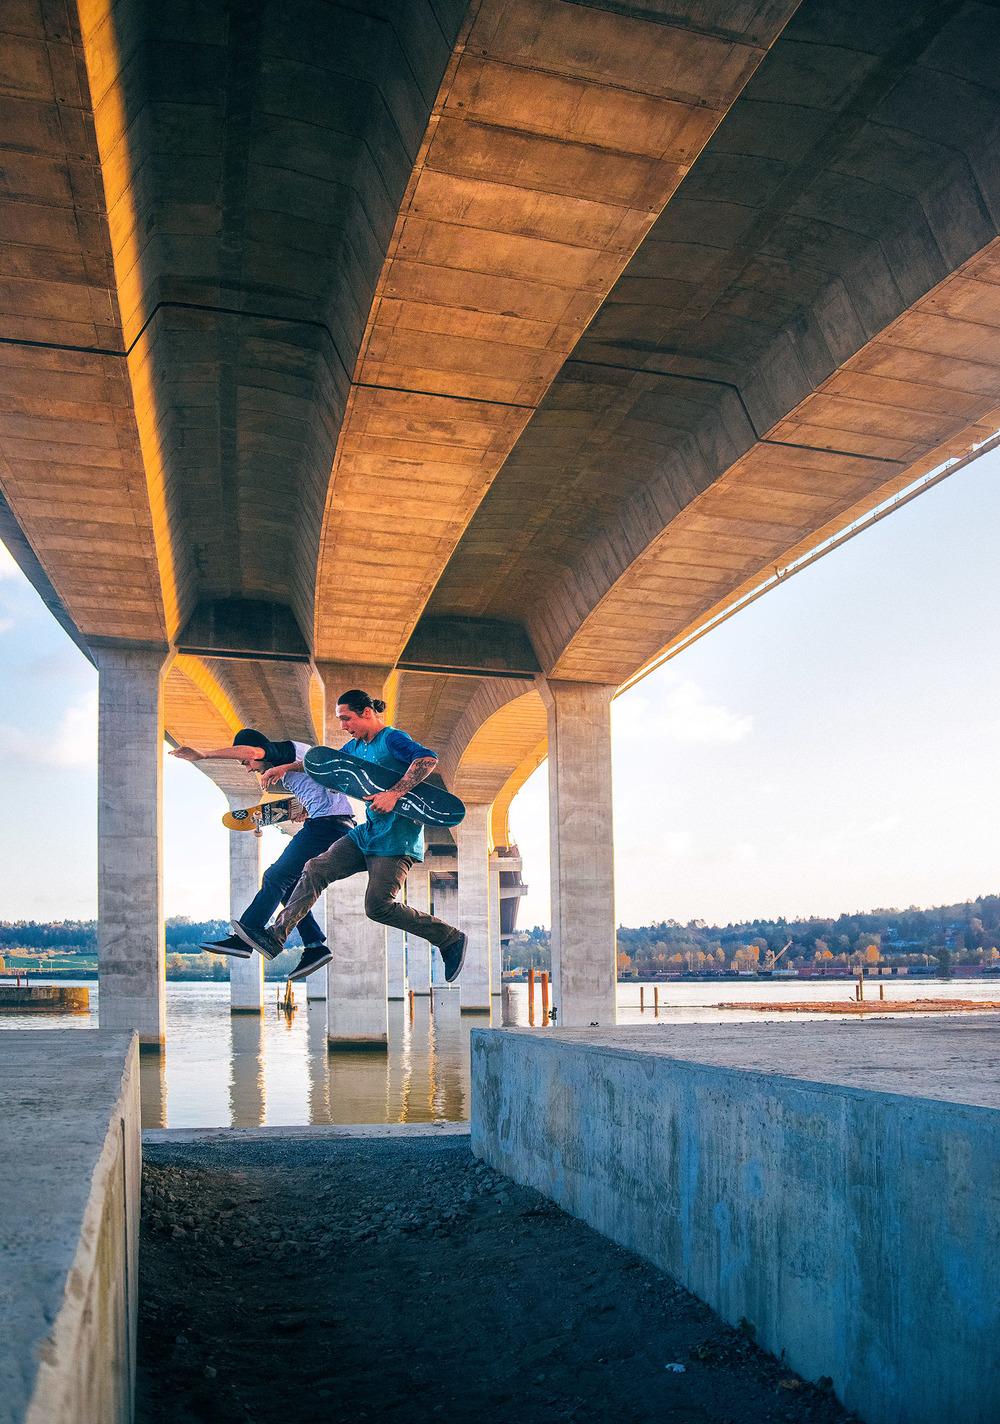 D & Z Jumping.jpg